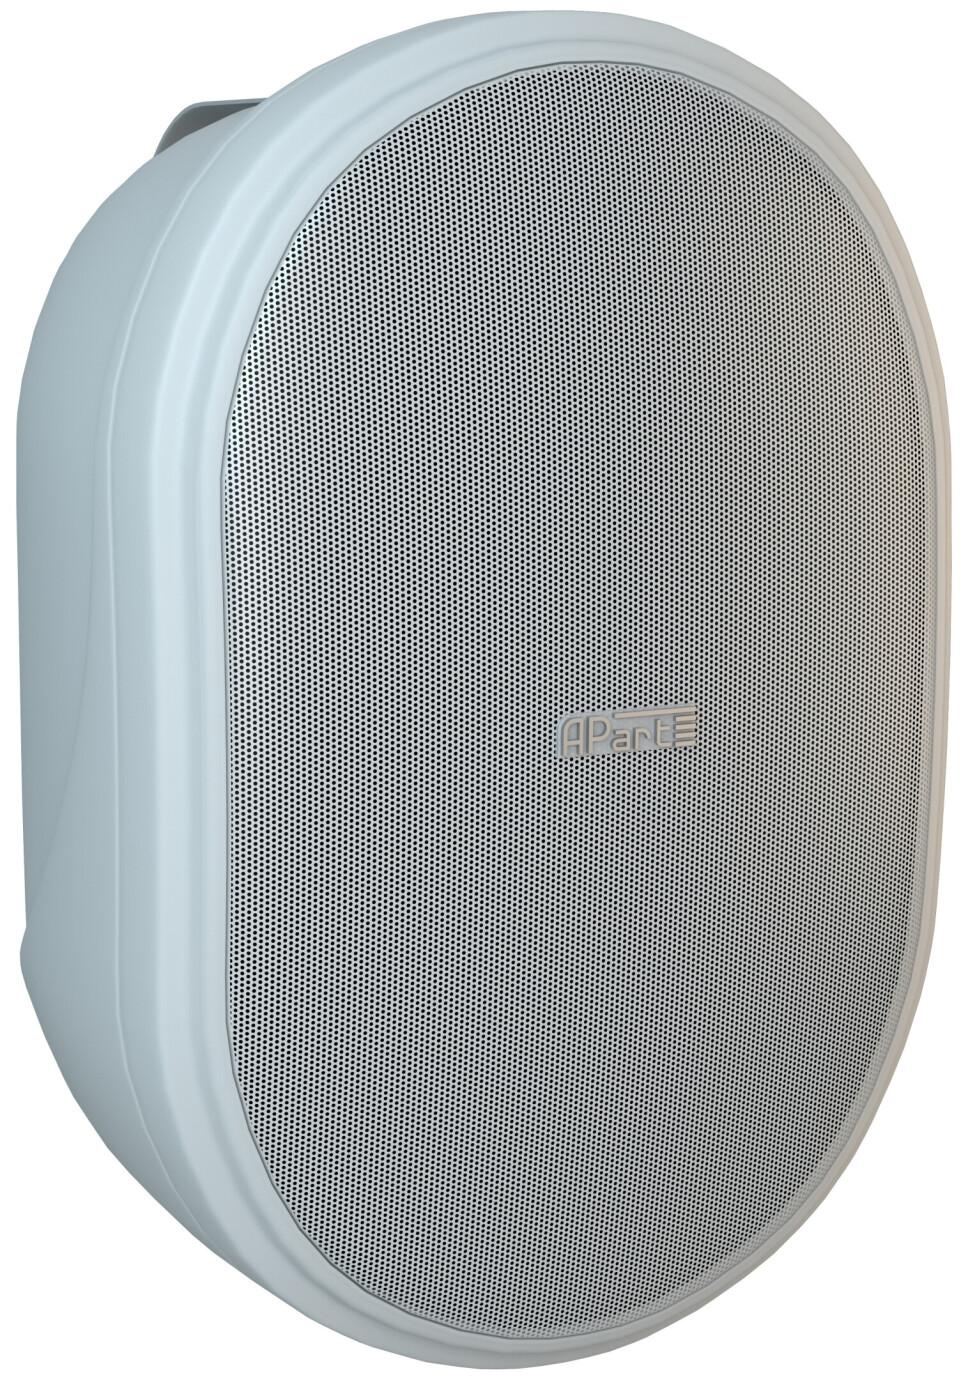 APart OVO8-W / 1 Pair speaker 160 W - White